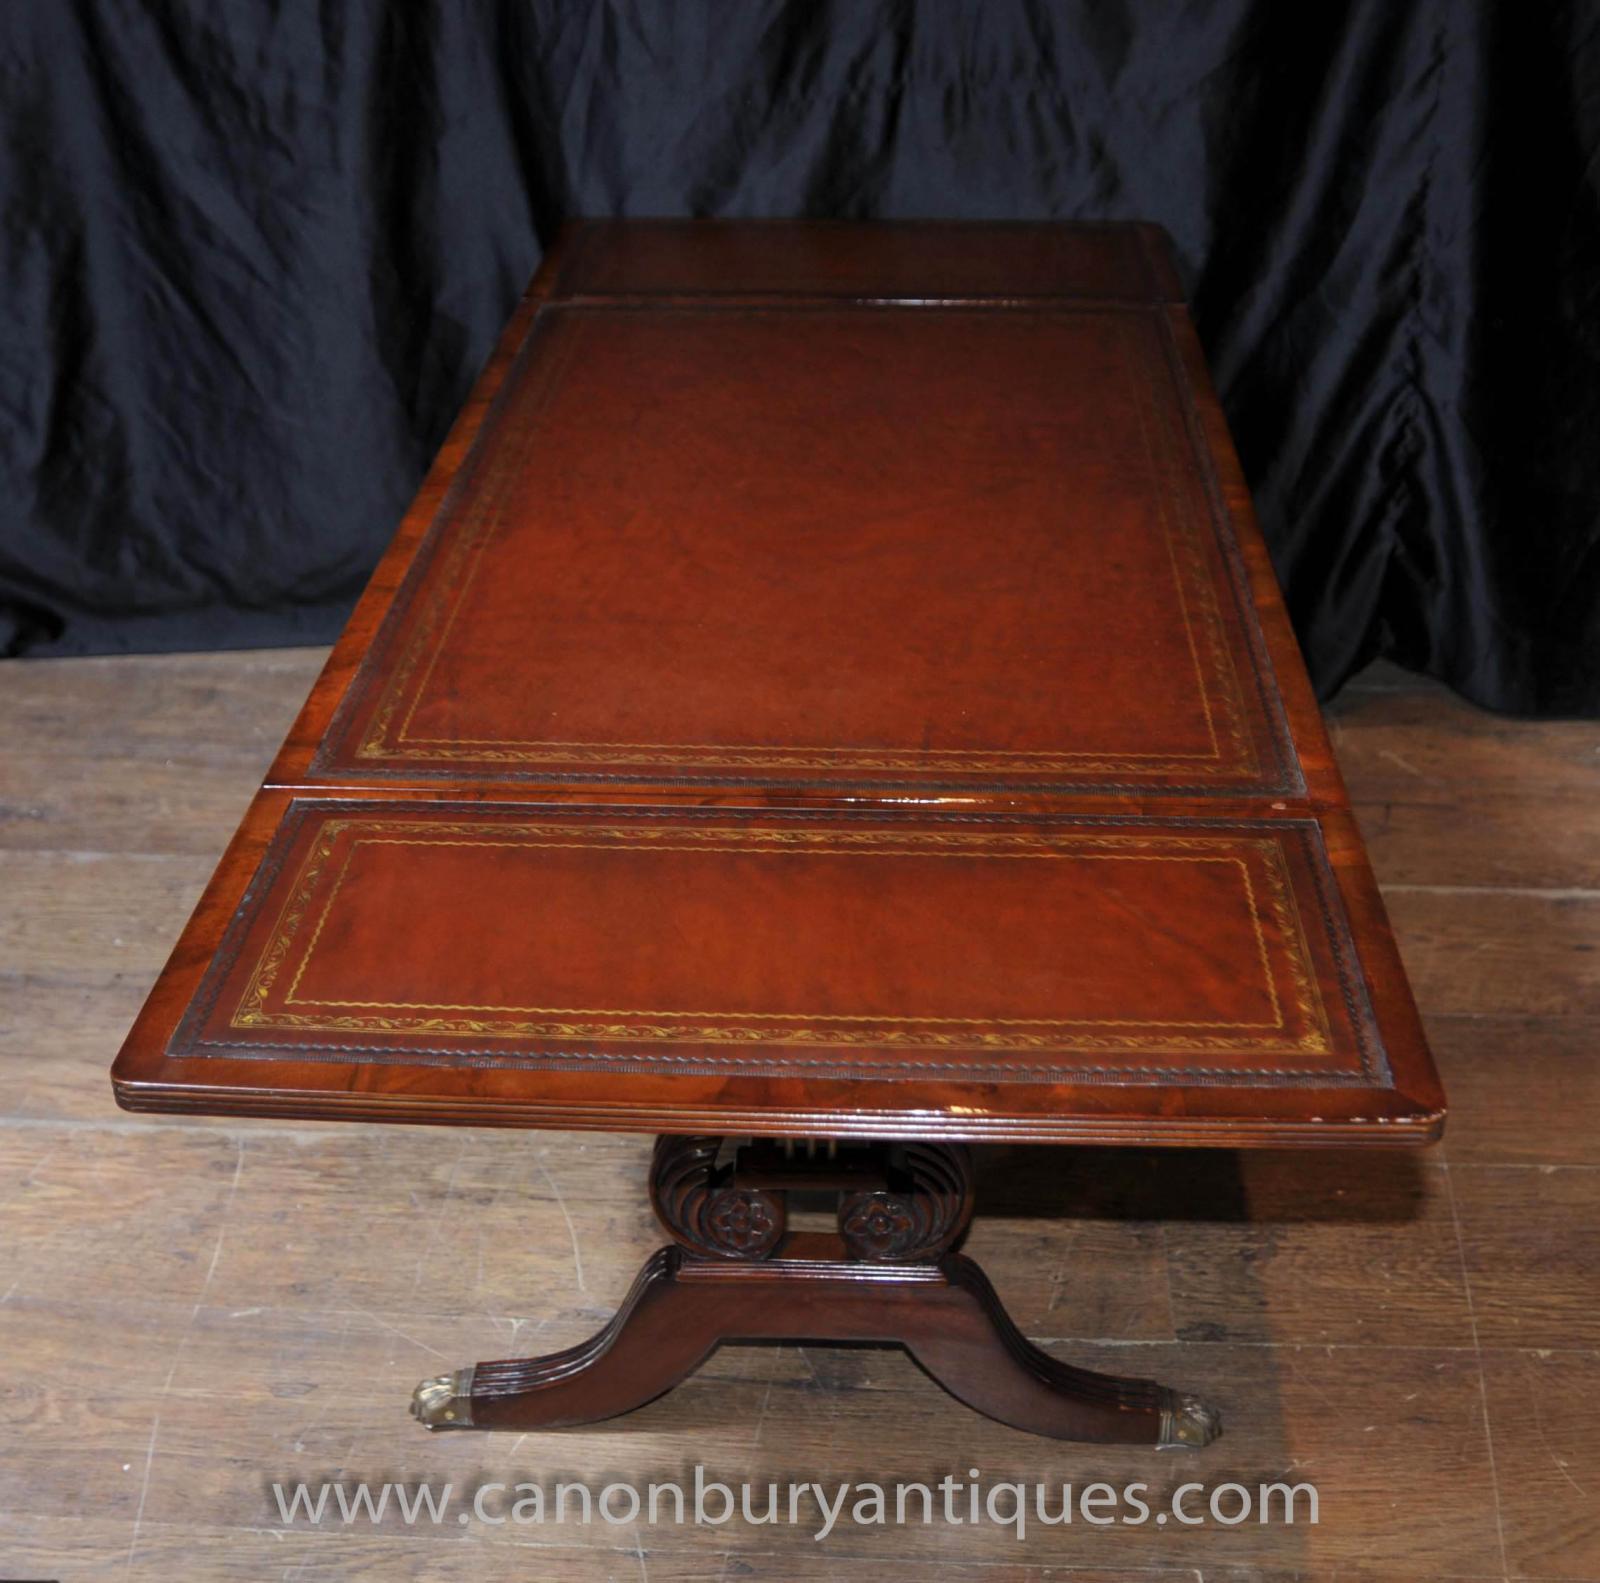 Mahogany Coffee Table: Mahogany Regency Coffee Table Extending Tables Desk